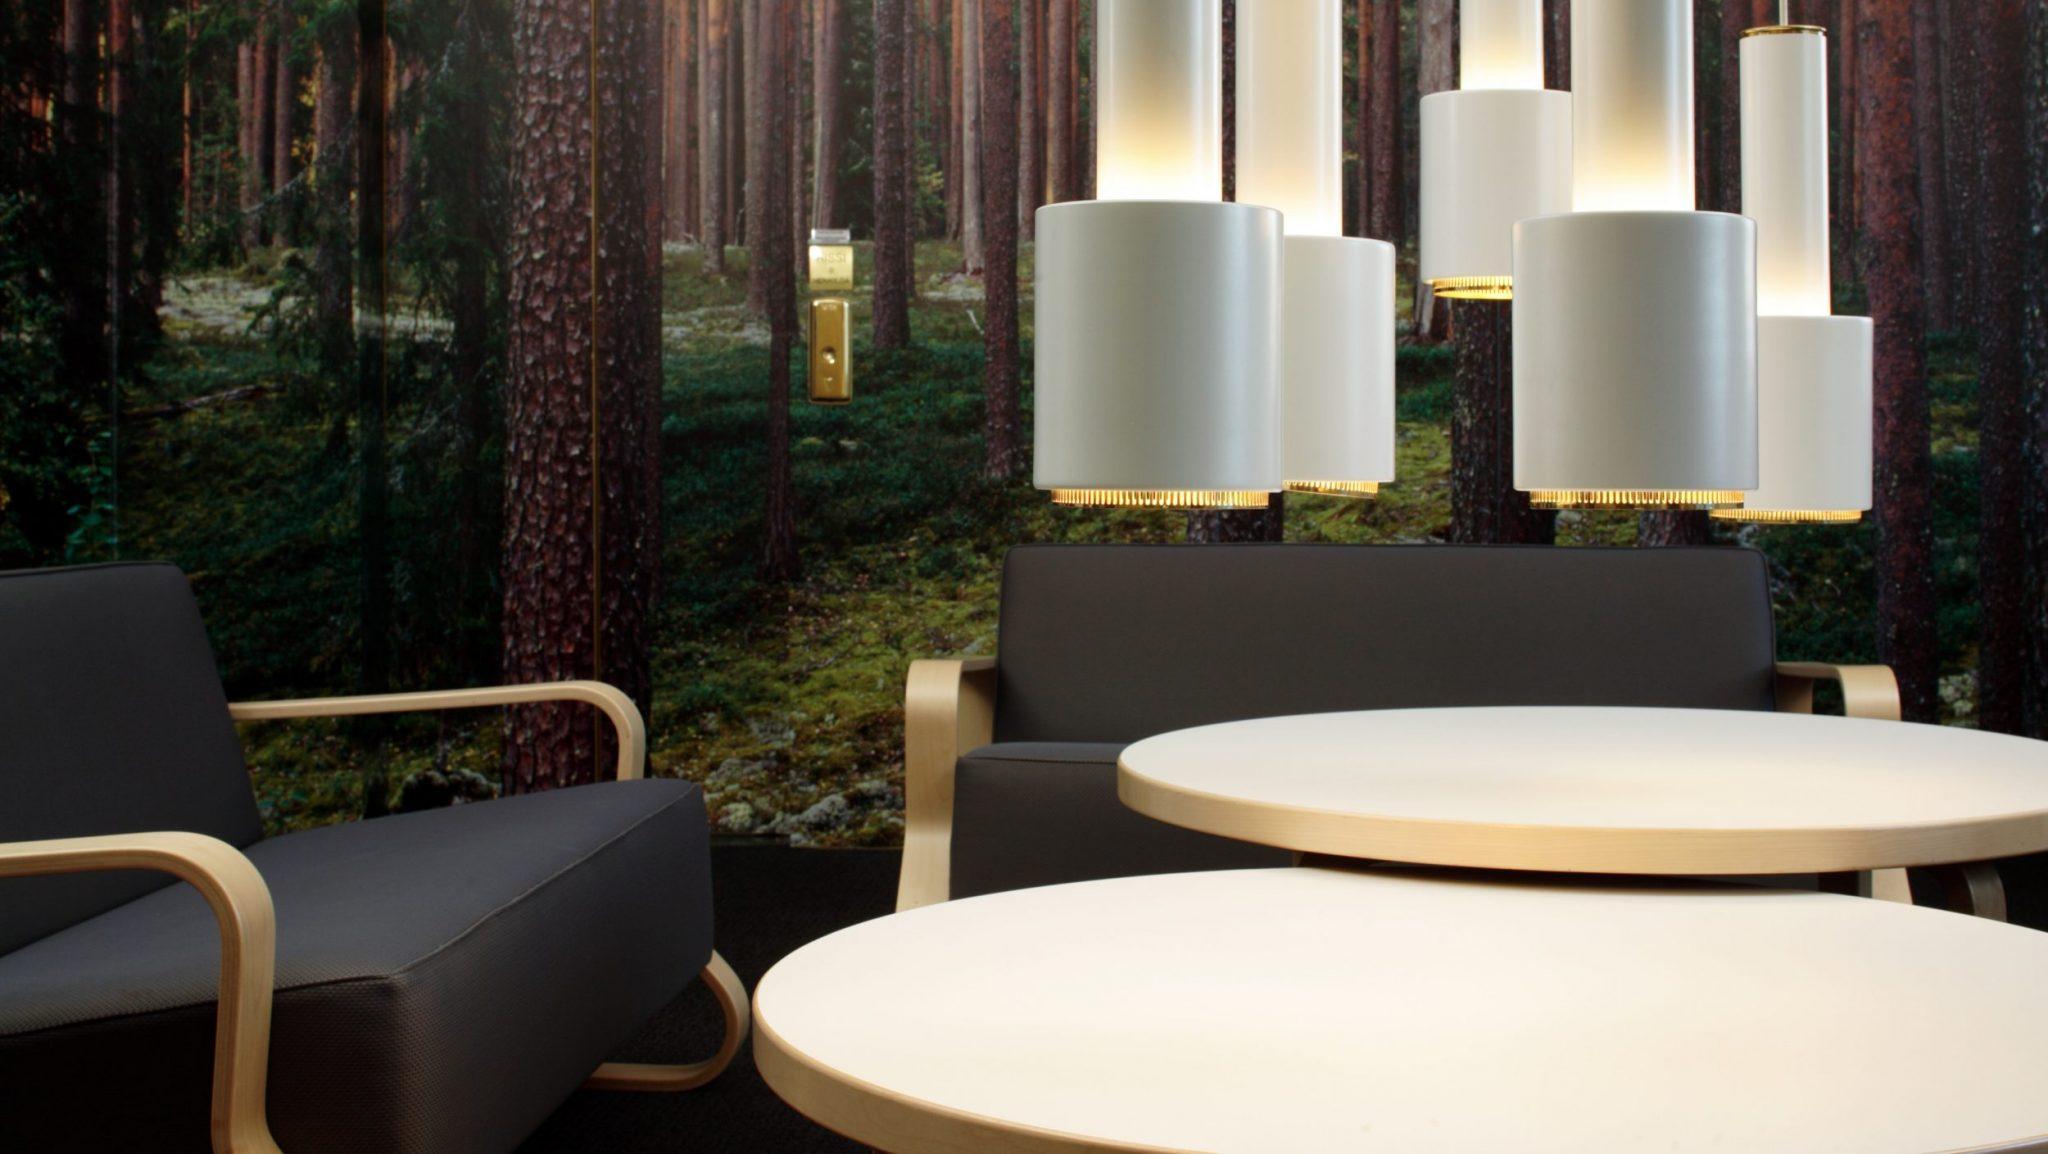 Hotel-Helka-Helsinki-GI-Project-6